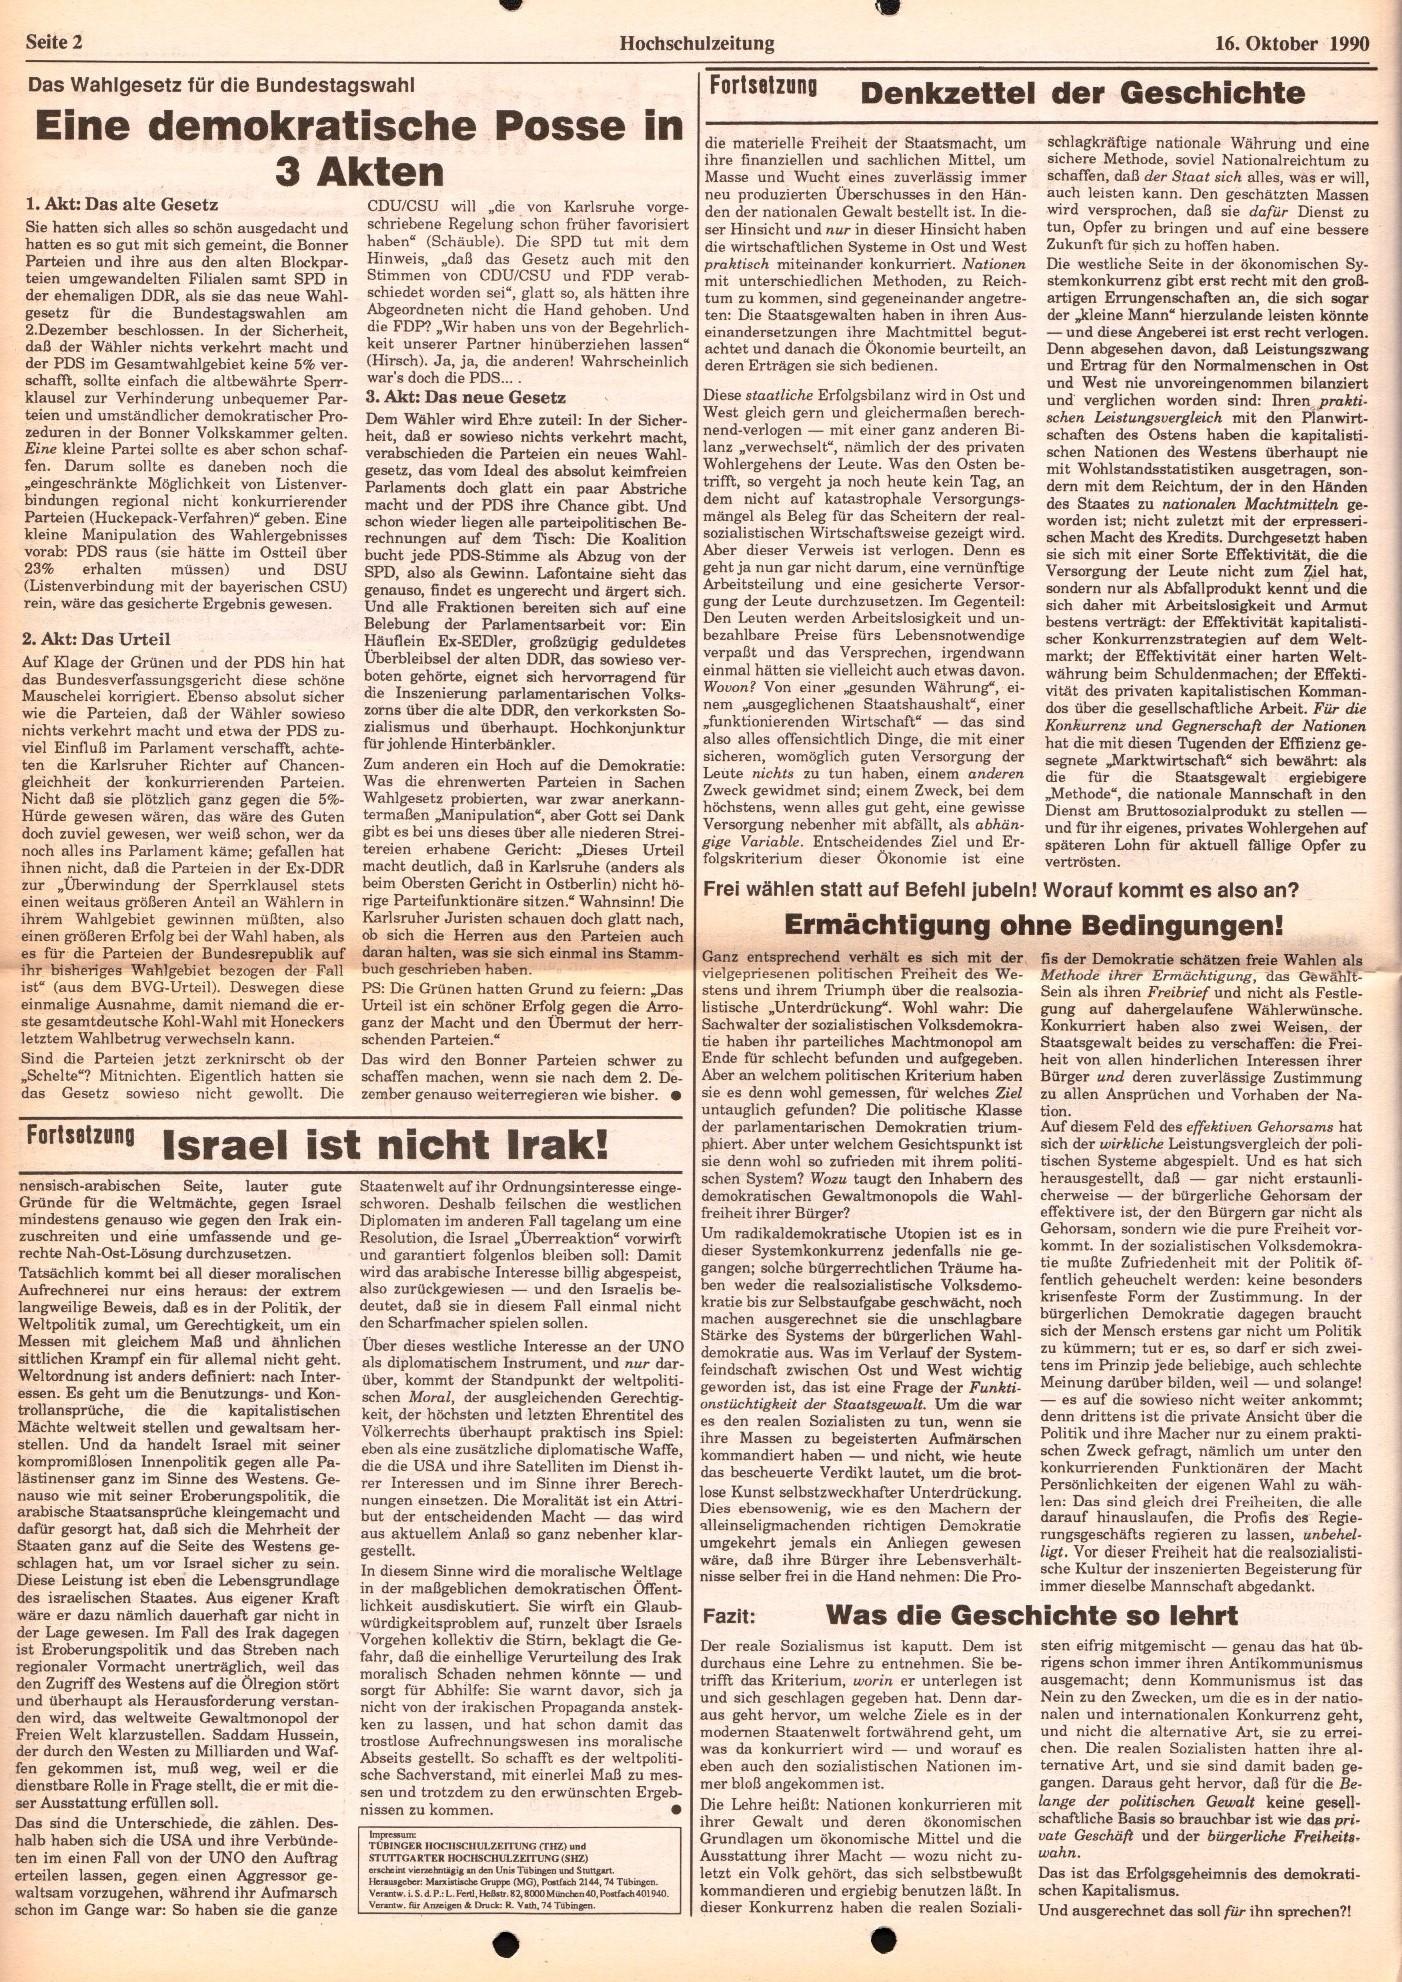 Stuttgart_MG_Hochschulzeitung_1990_10_02